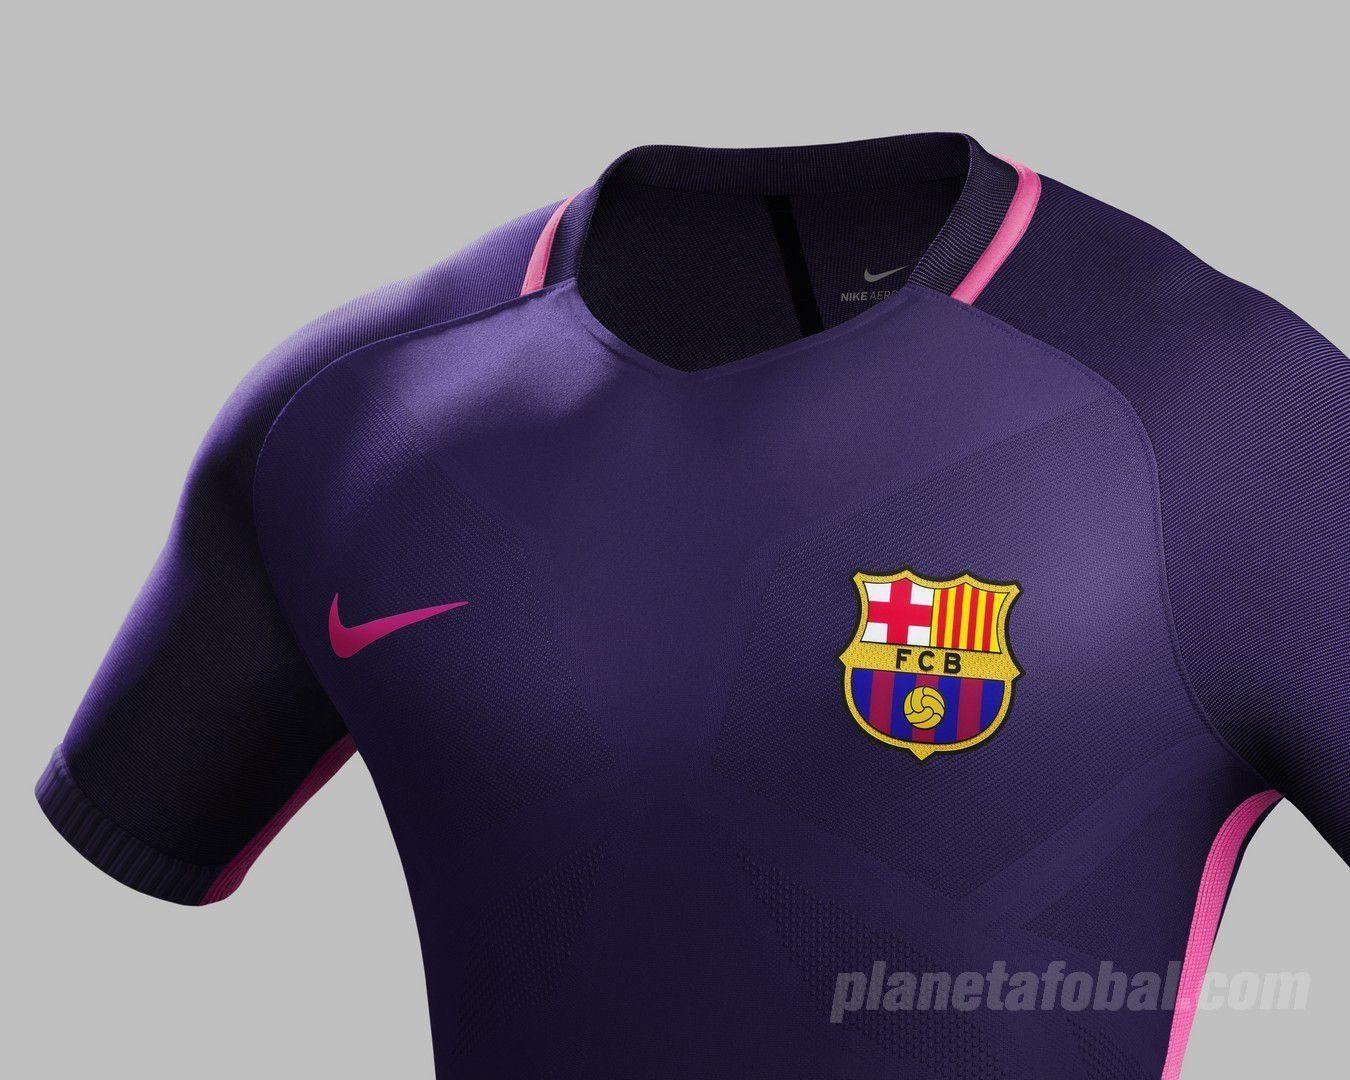 0dbd1fcd81e Camiseta suplente Nike del Barcelona 2016 17